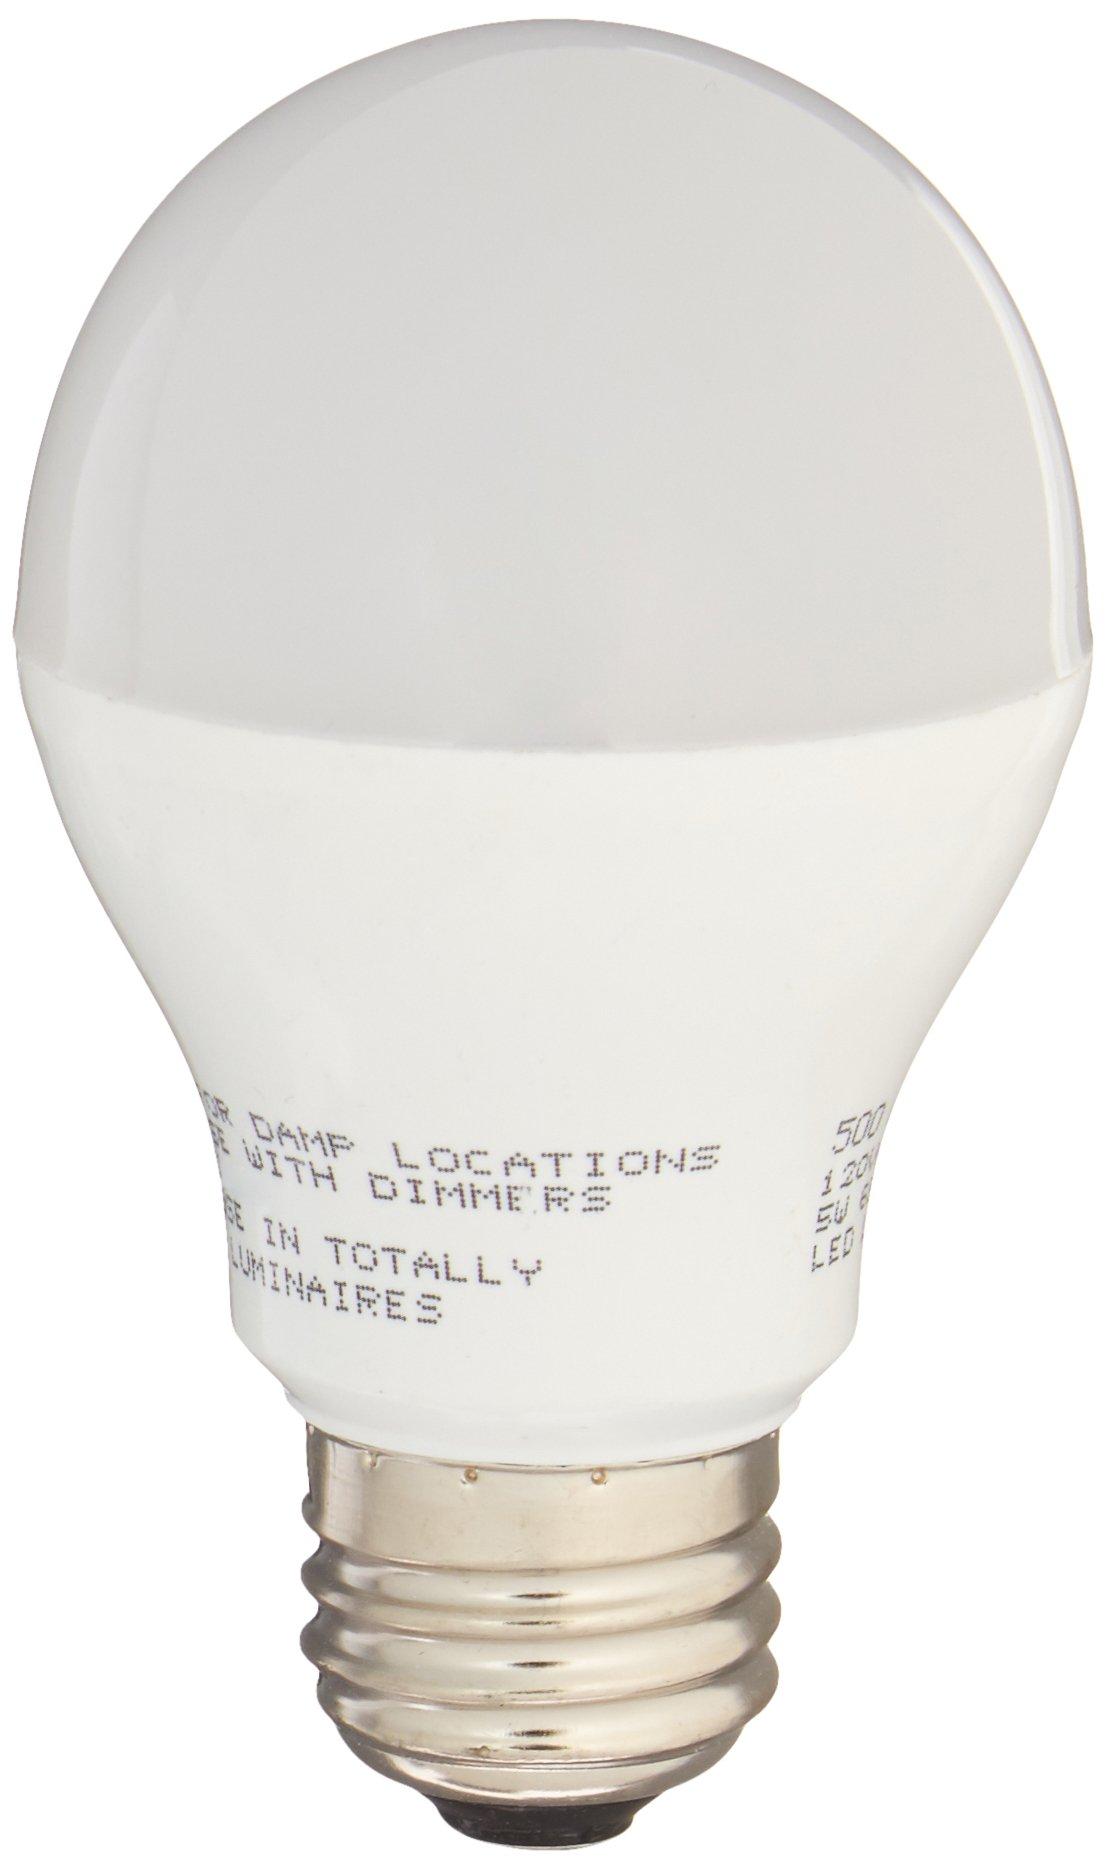 Miracle LED 604010 5-Watt Rough Service Garage Door Led Bulbs, A17, Long Life Energy Saver Bulb, Cool White, 6-Pack,